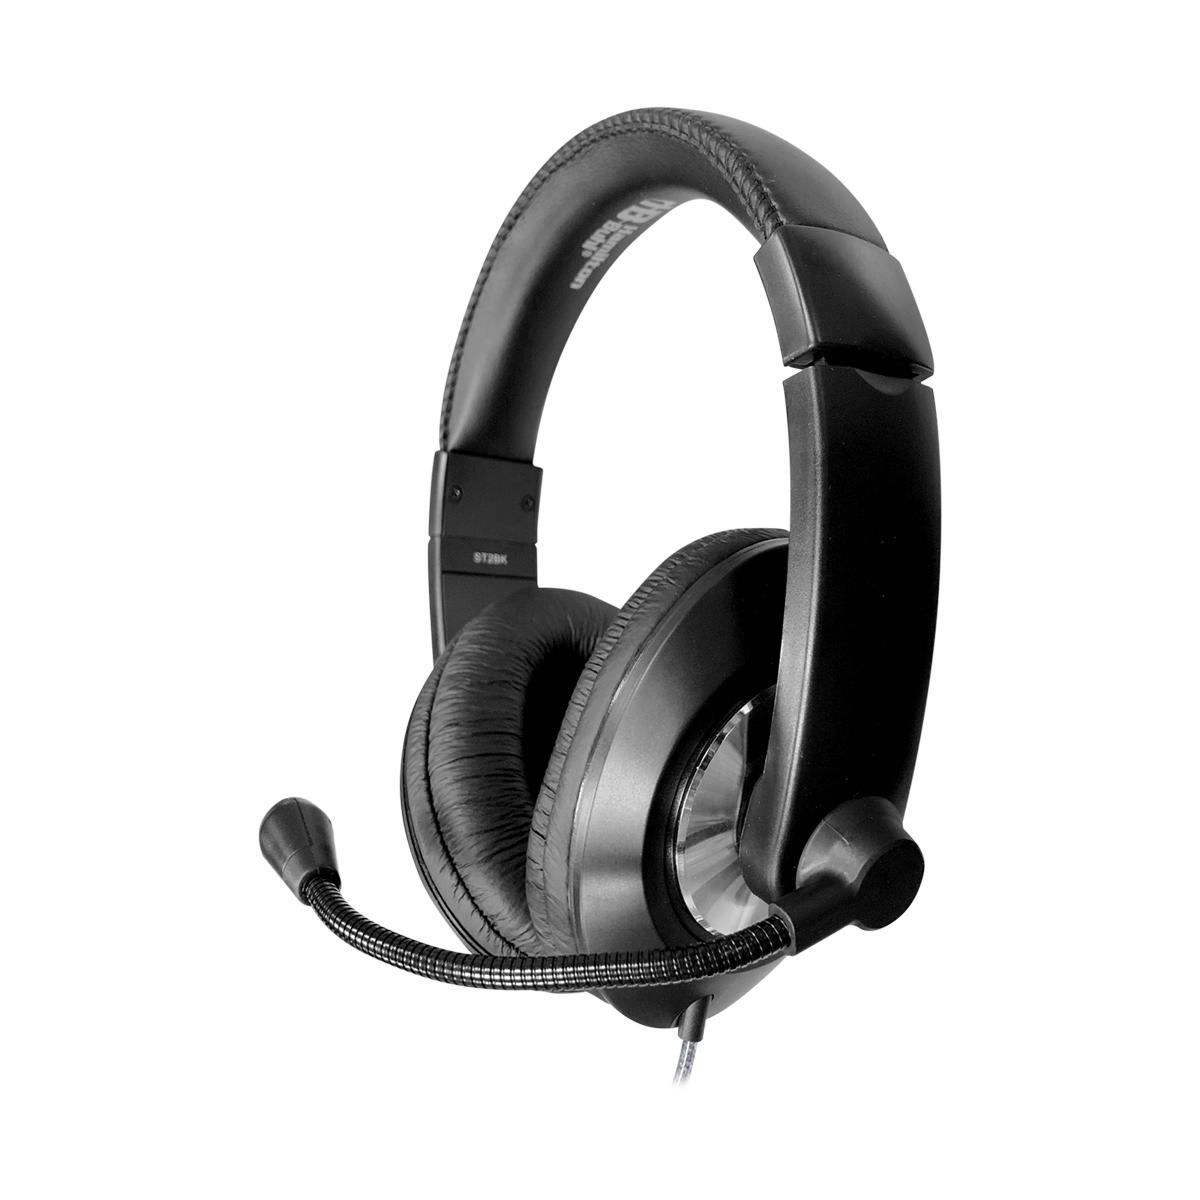 Smart-Trek Deluxe Stereo Headset with USB Plug